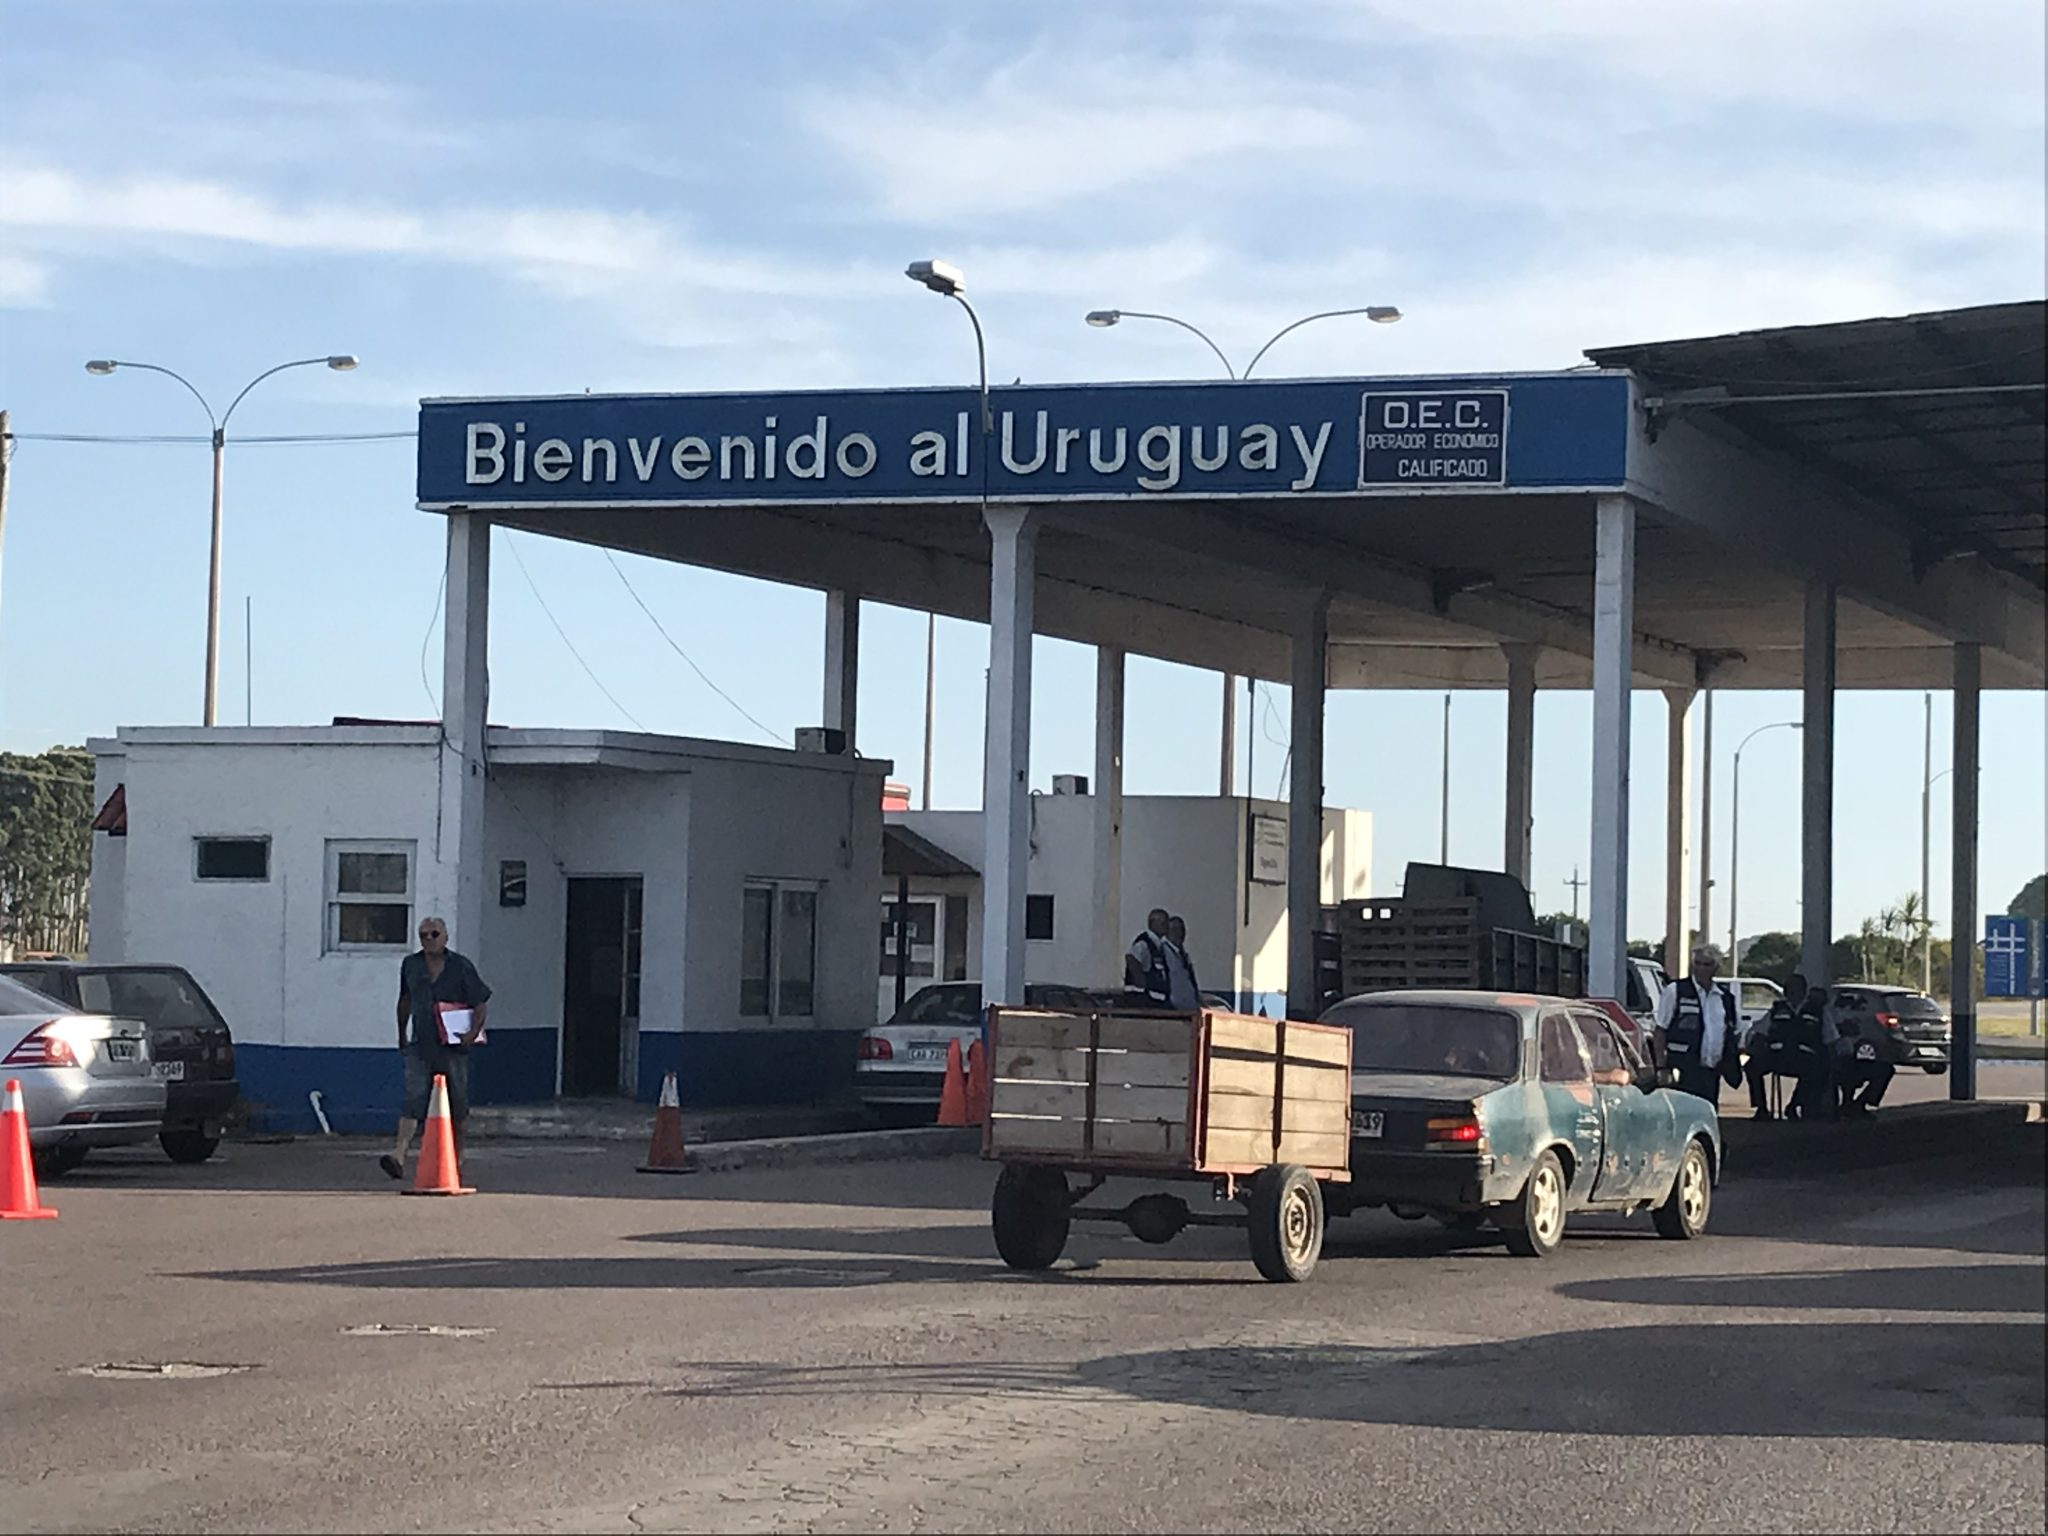 Transporte em Punta del Este